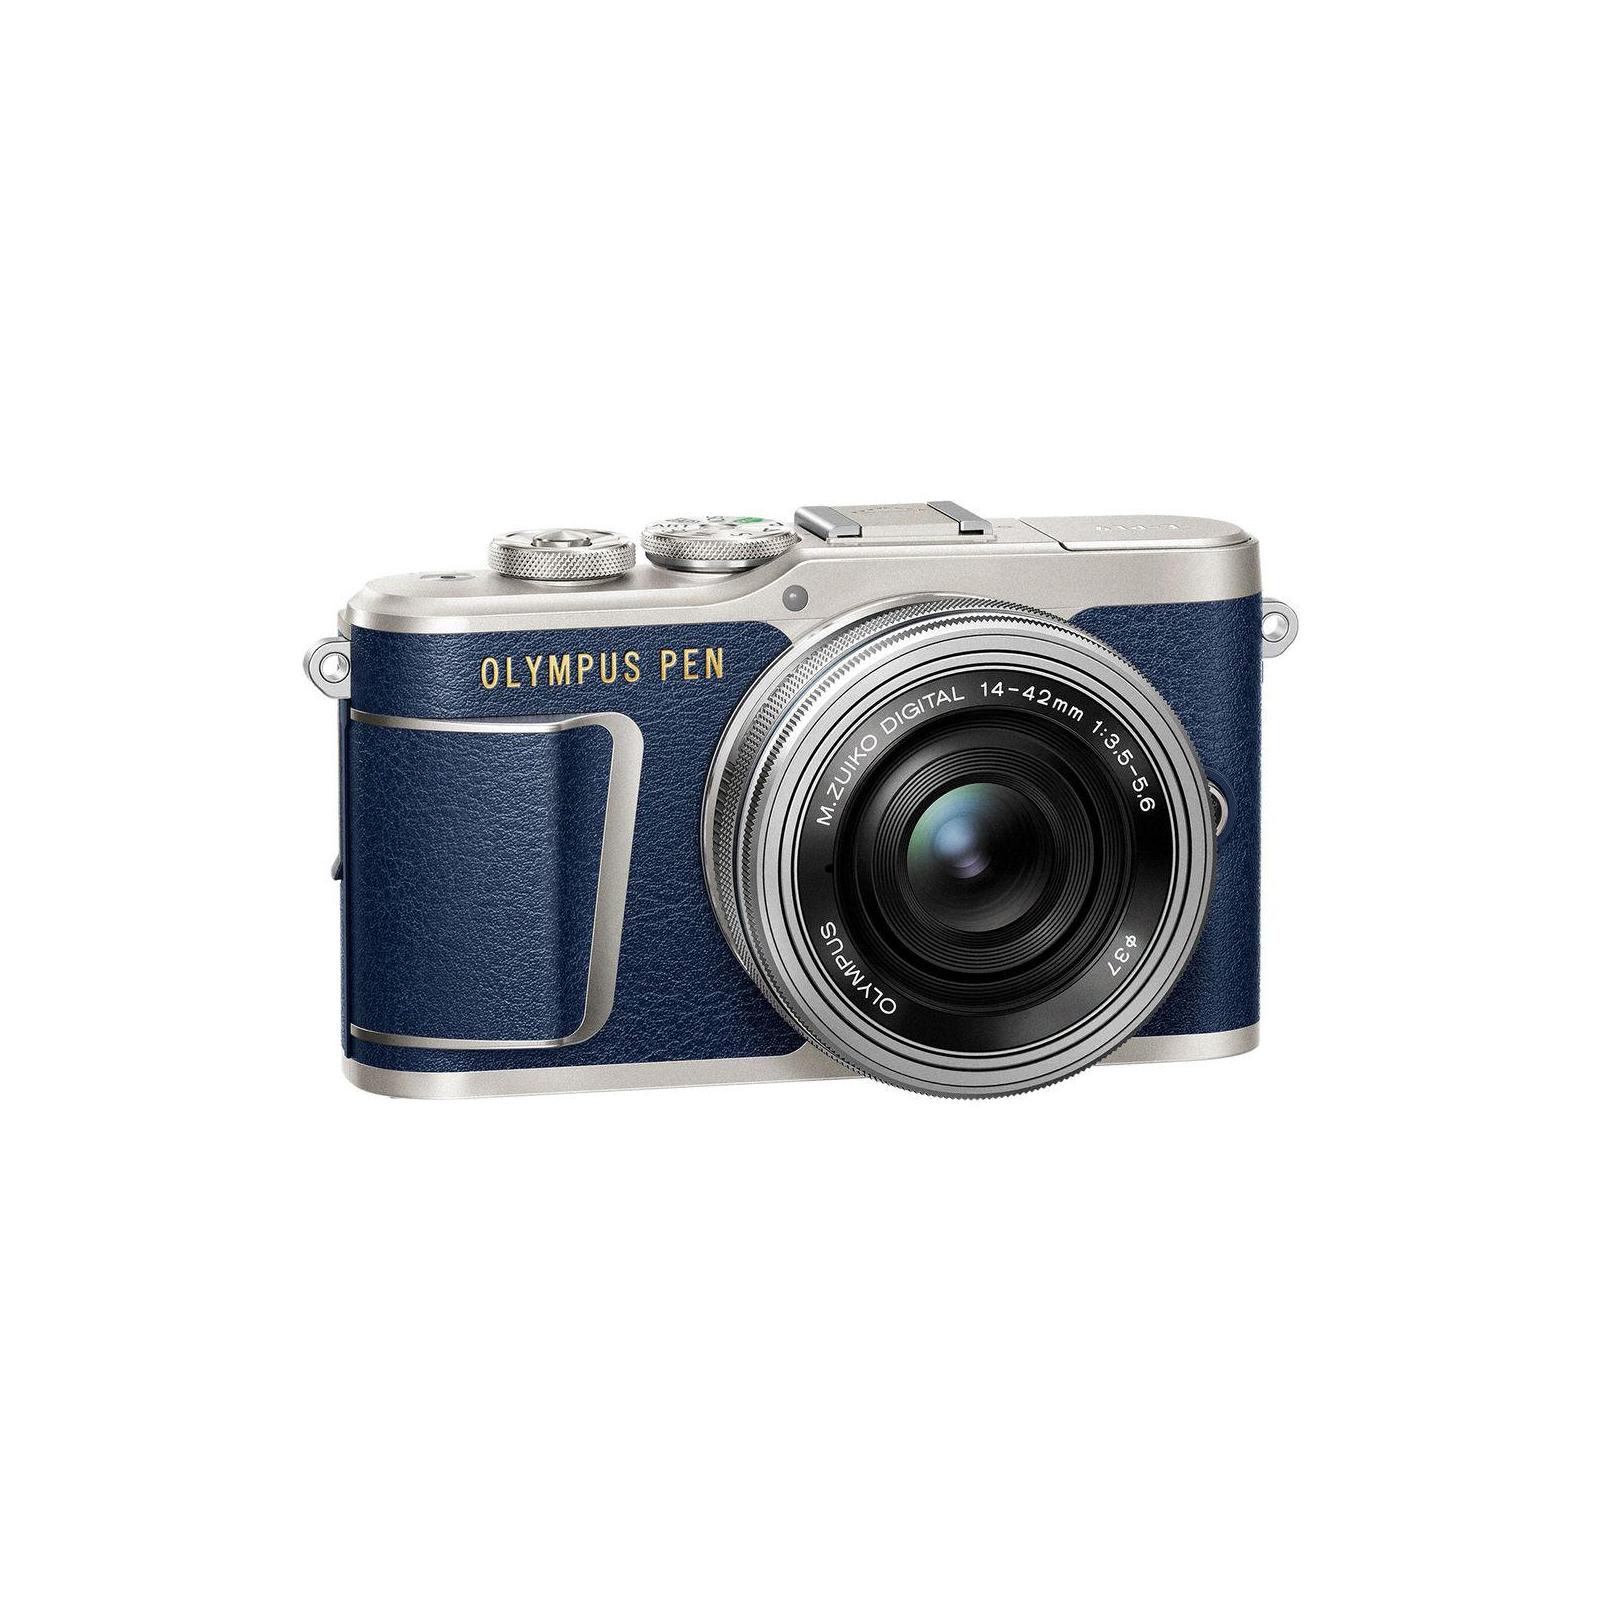 Цифровой фотоаппарат OLYMPUS E-PL9 14-42 mm Pancake Zoom Kit blue/silver (V205092UE000) изображение 4